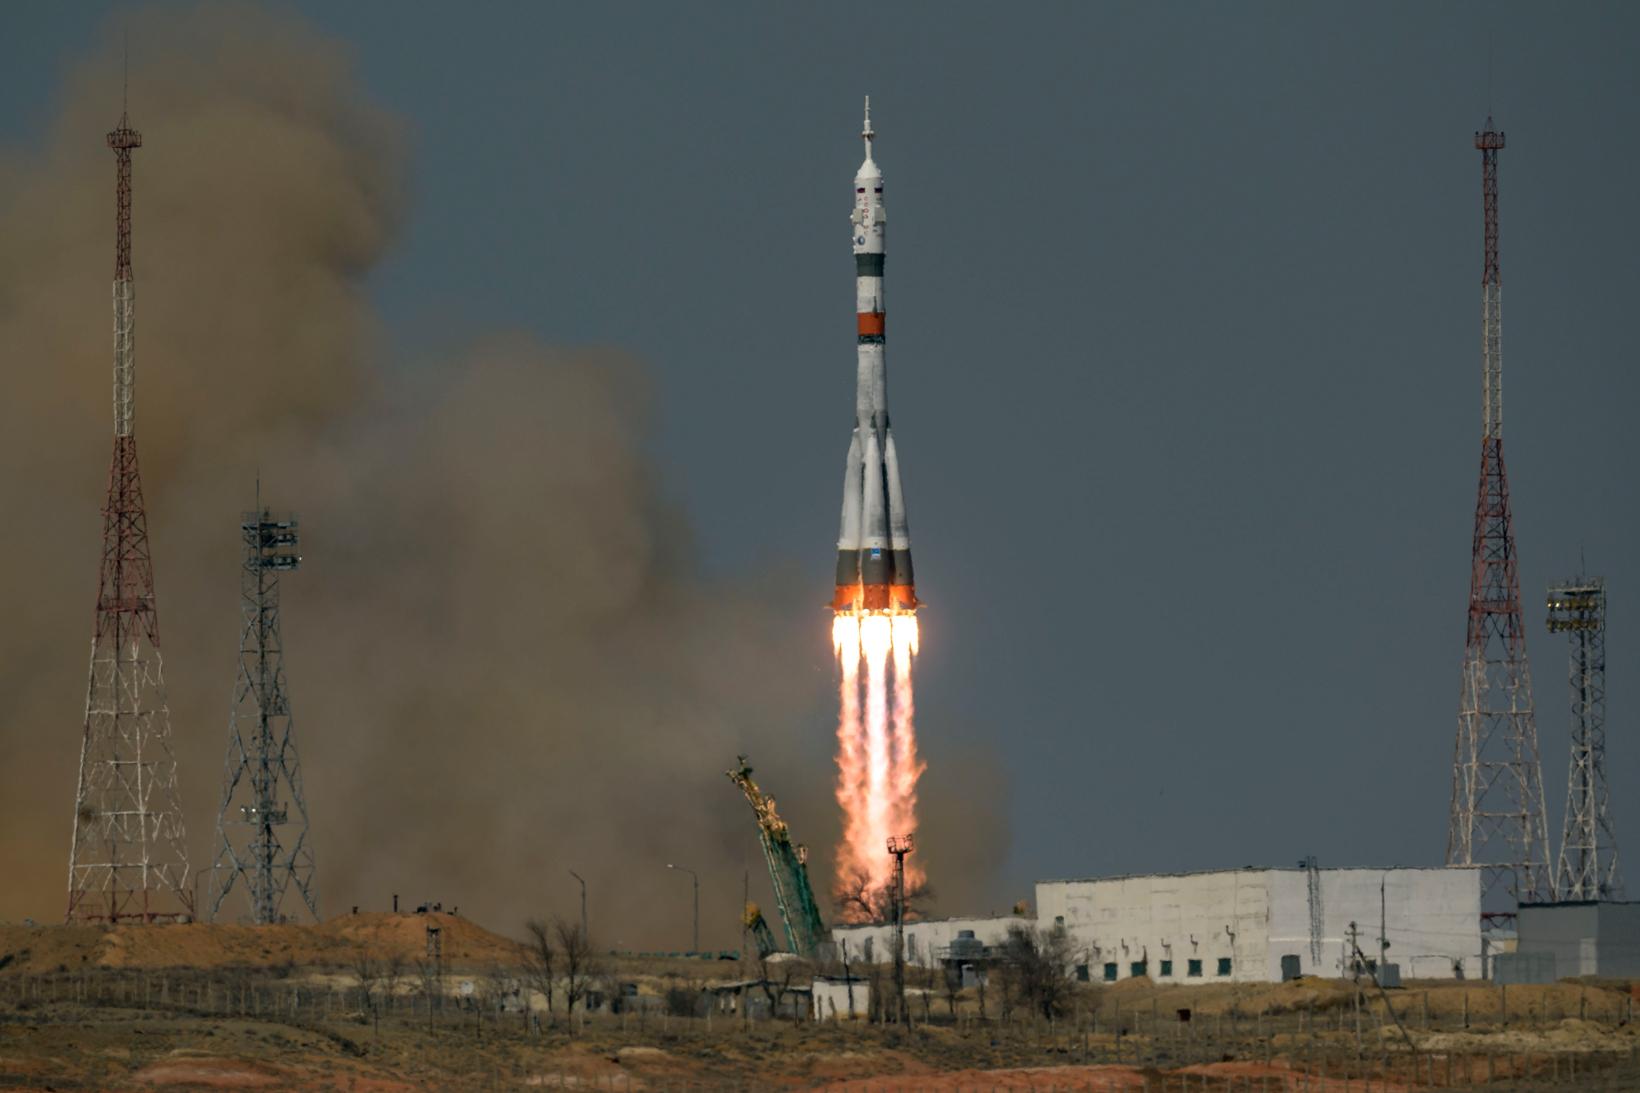 NASA Expedition 65 Soyuz Launch